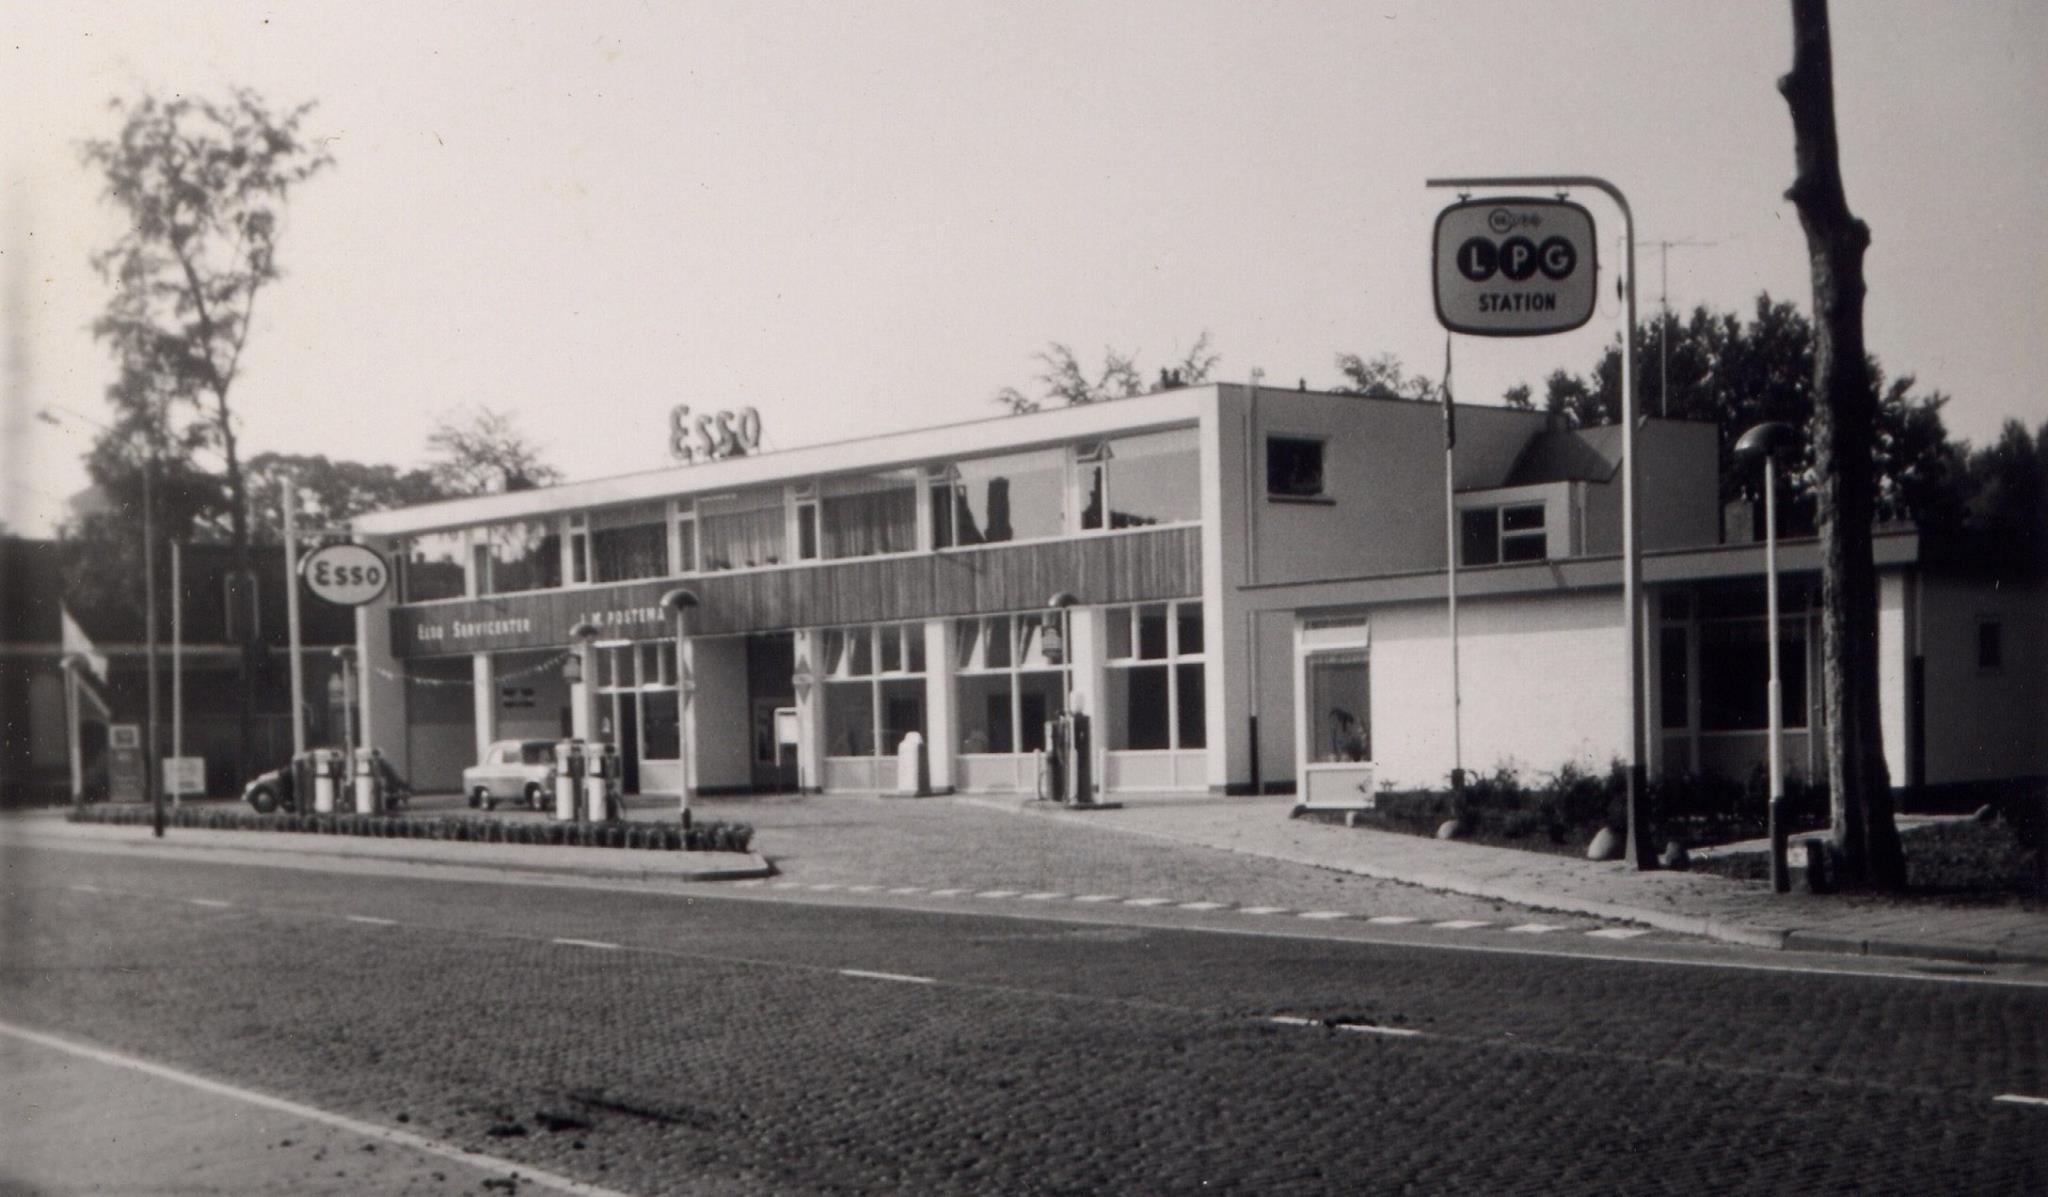 Postema-J-M-Rijkstraatweg-Haren-garage--ca-1962